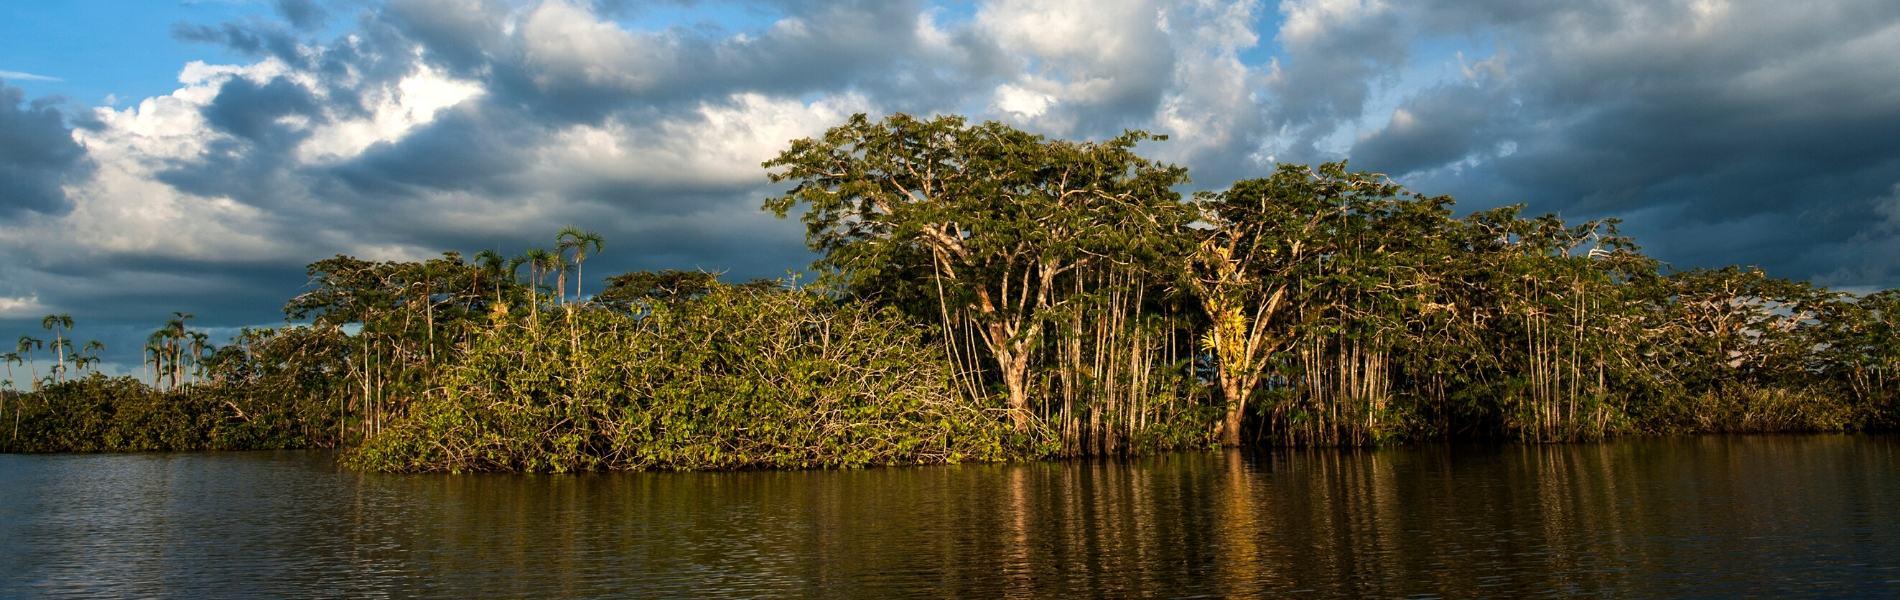 Cuyabeno Amazon Jungle Tour